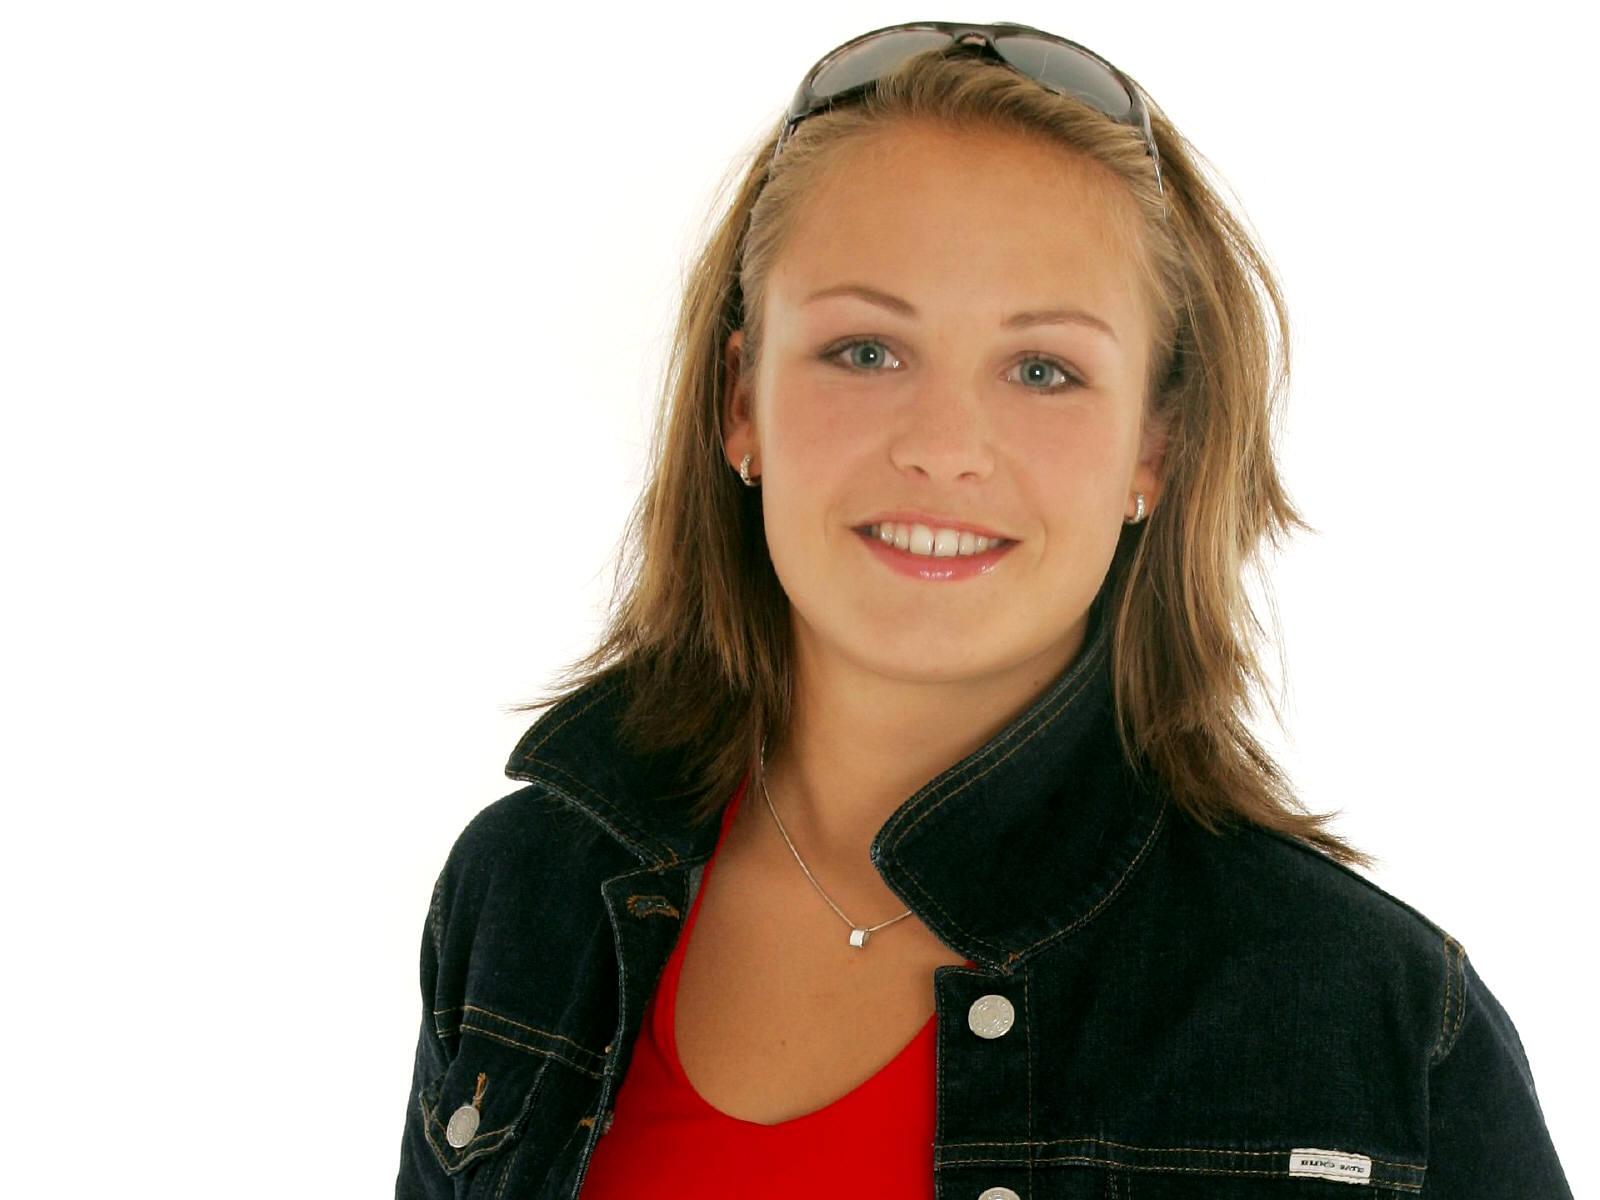 Personal life of Magdalena Neuner 43